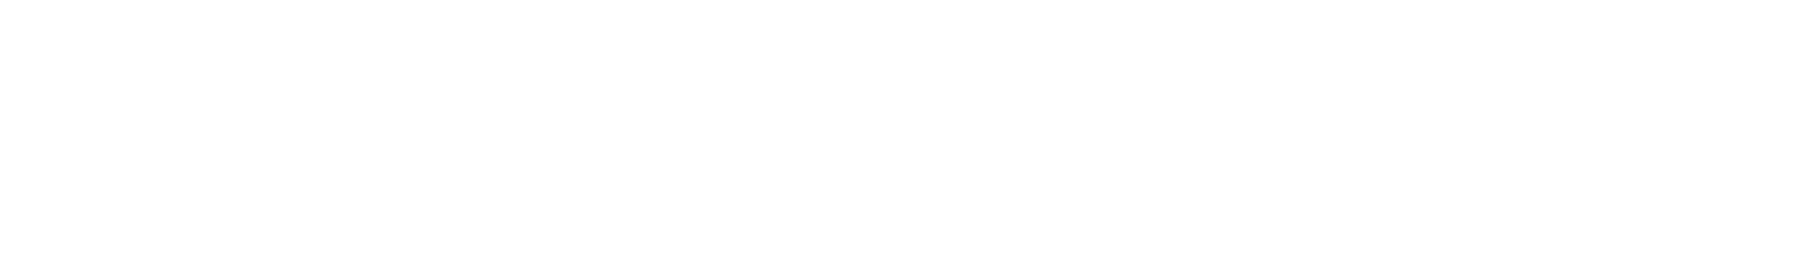 electro punk anthem chorus